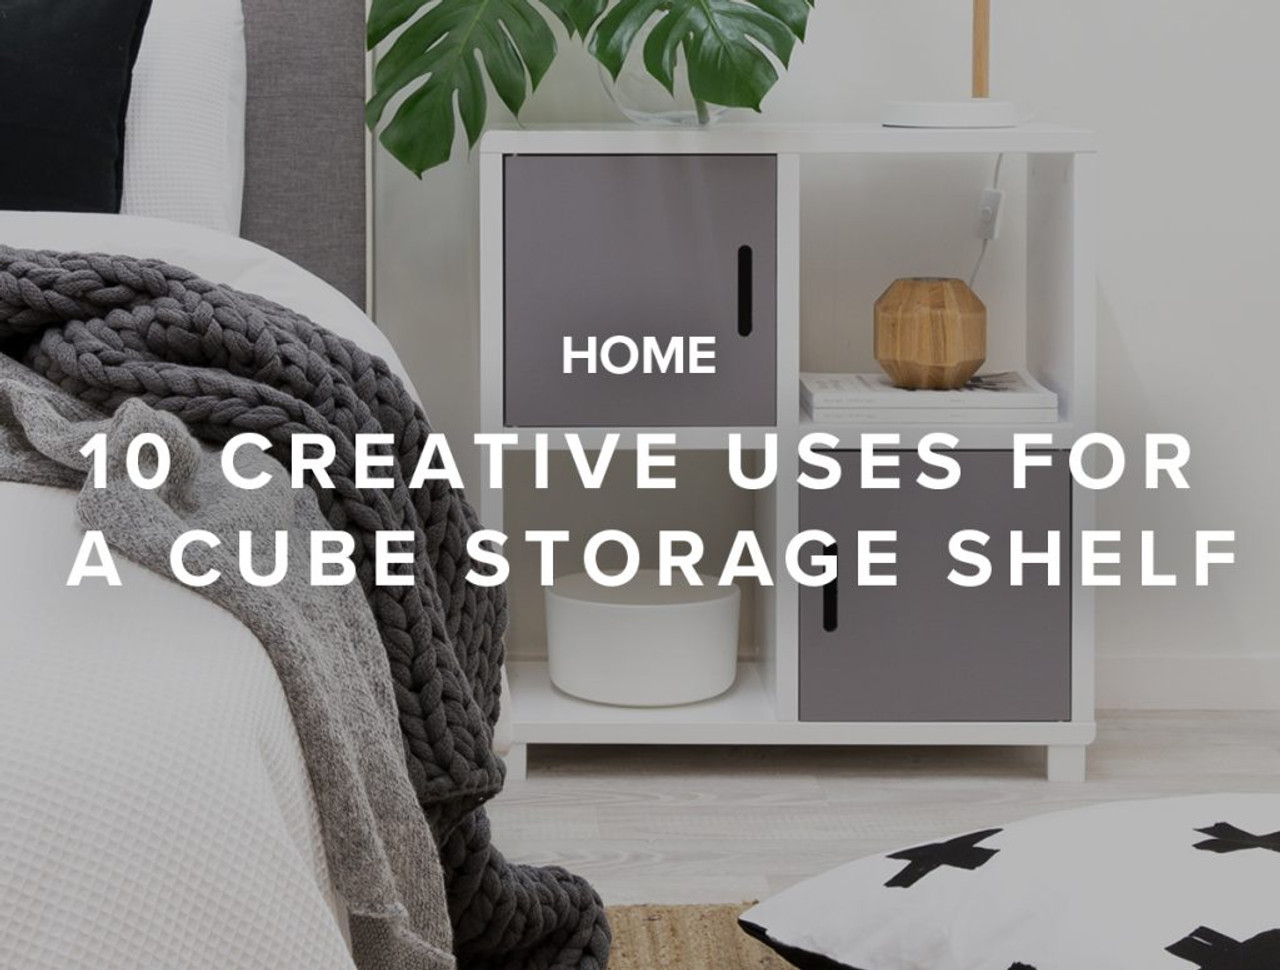 10 Creative Uses for A Cube Storage Shelf